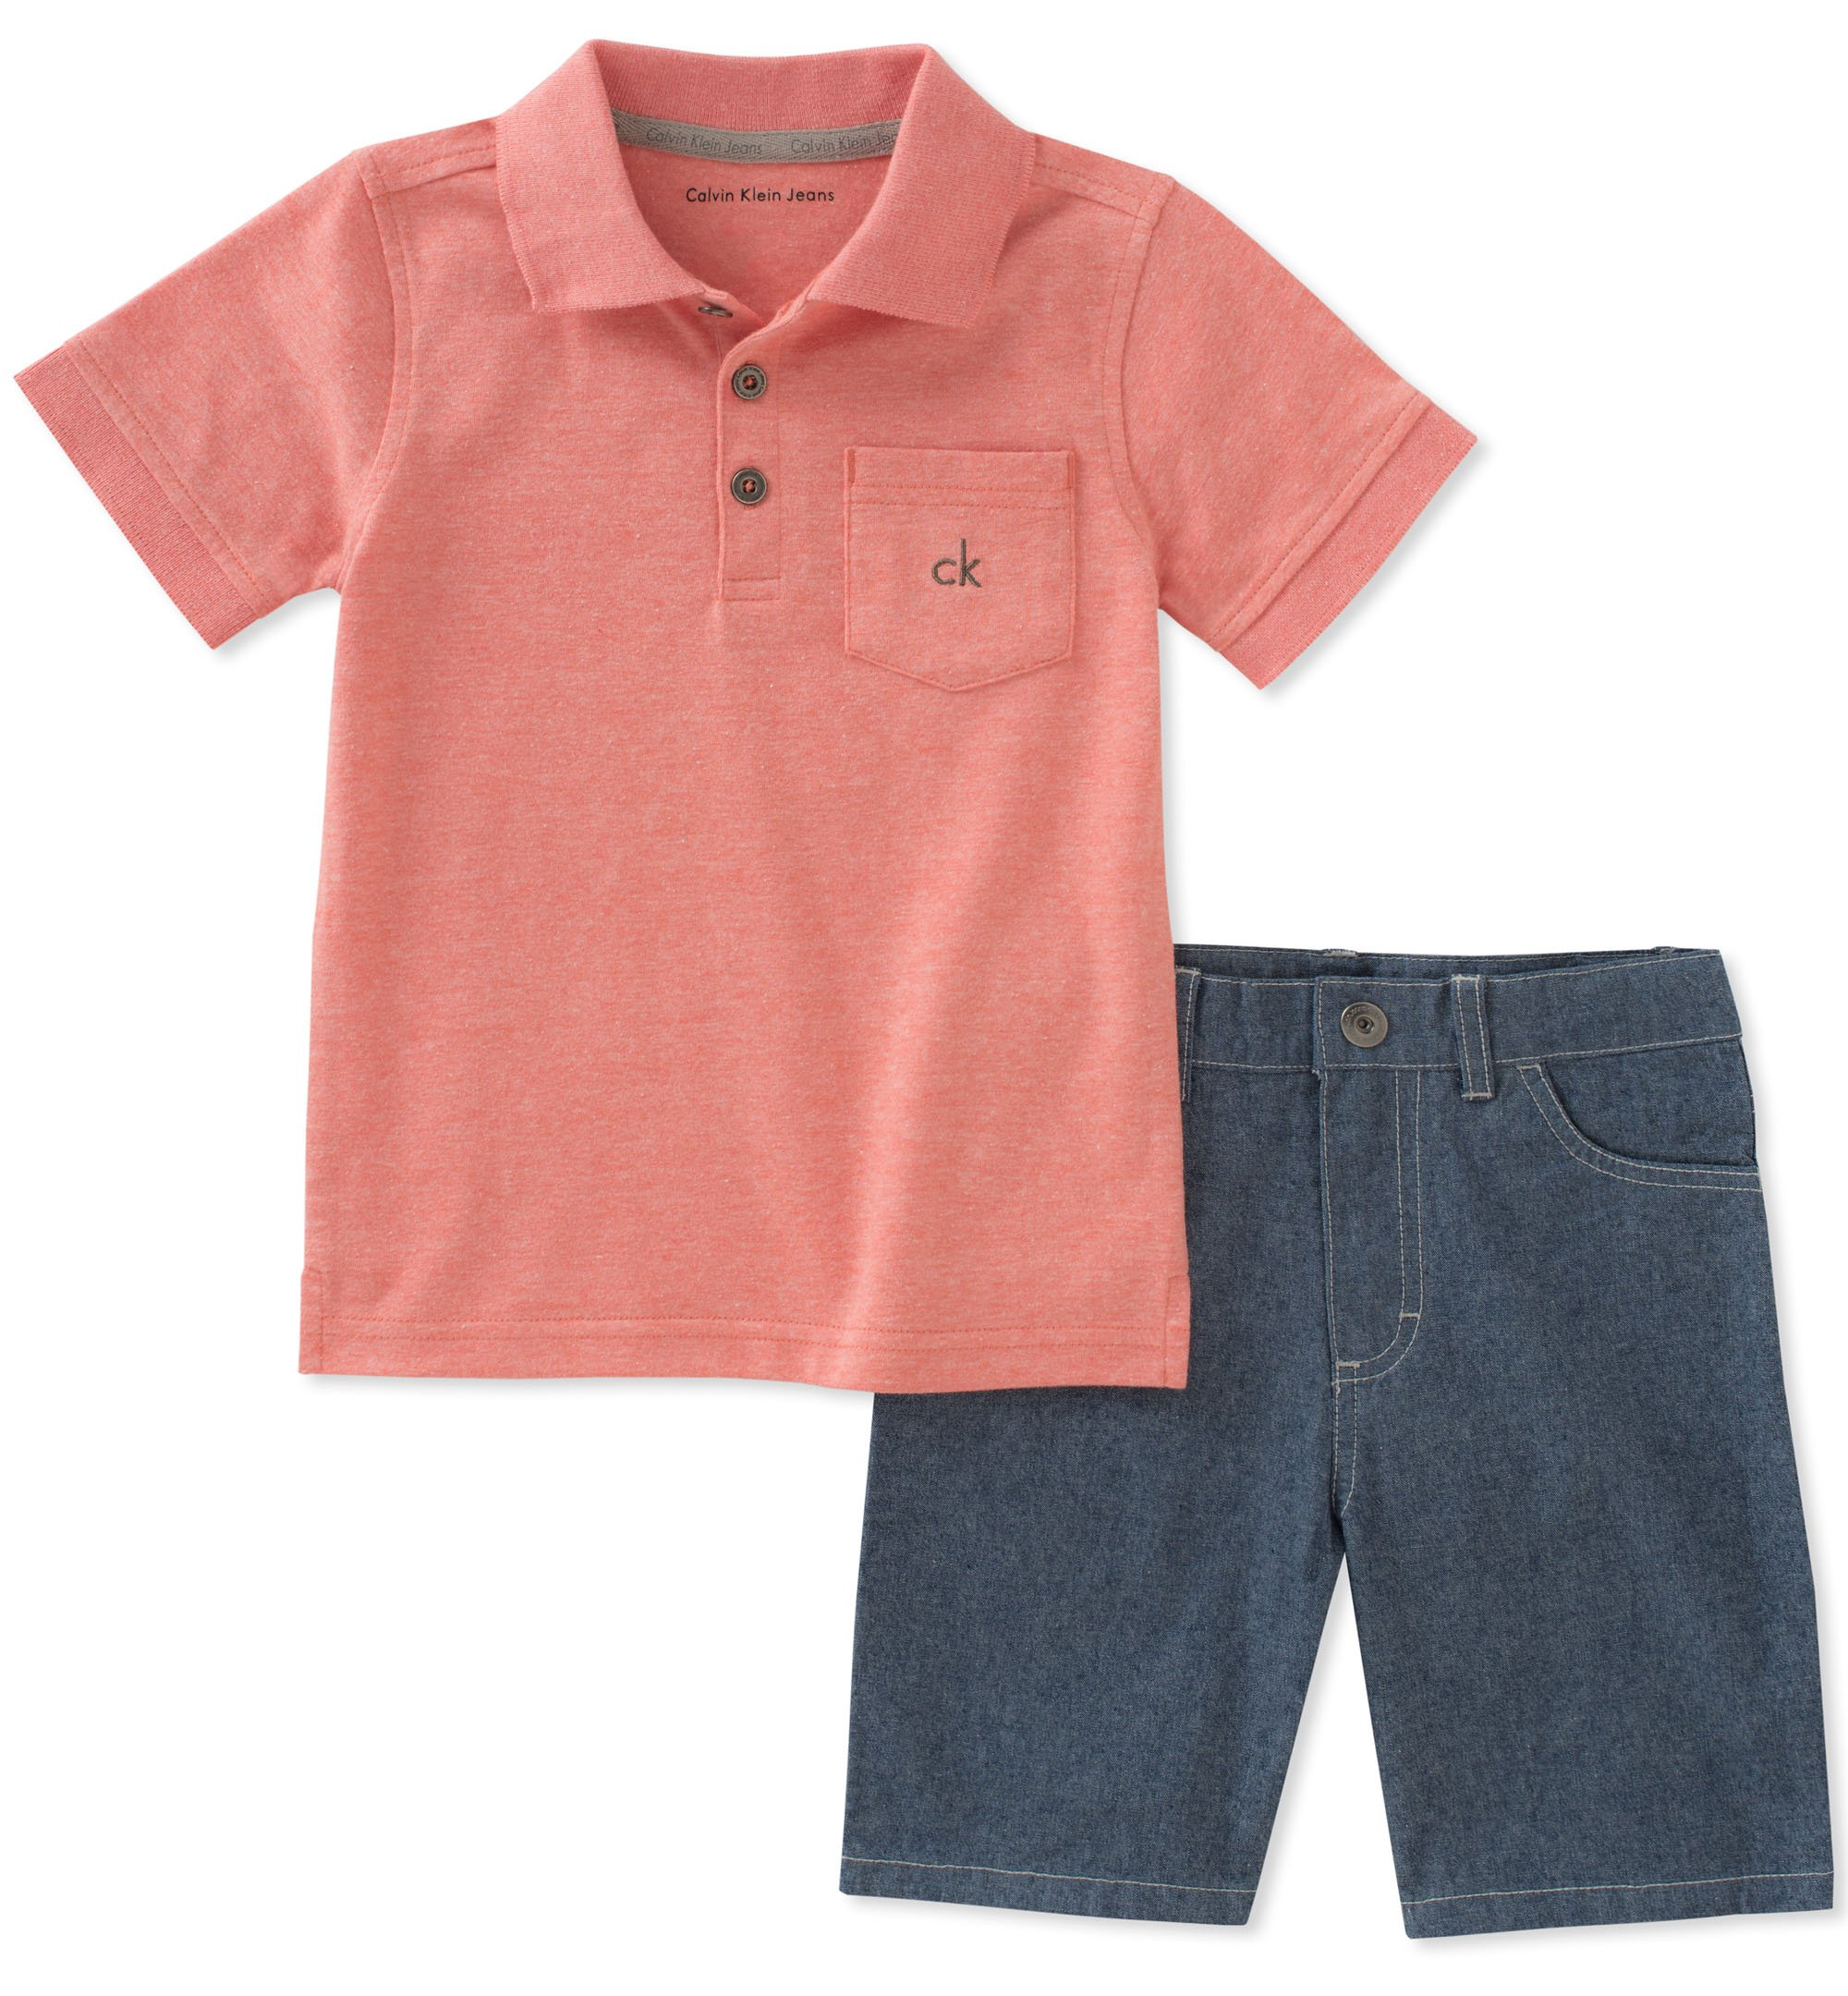 Calvin Klein Boys' Toddler 2 Pieces Polo Shorts Set, Orange, 2T